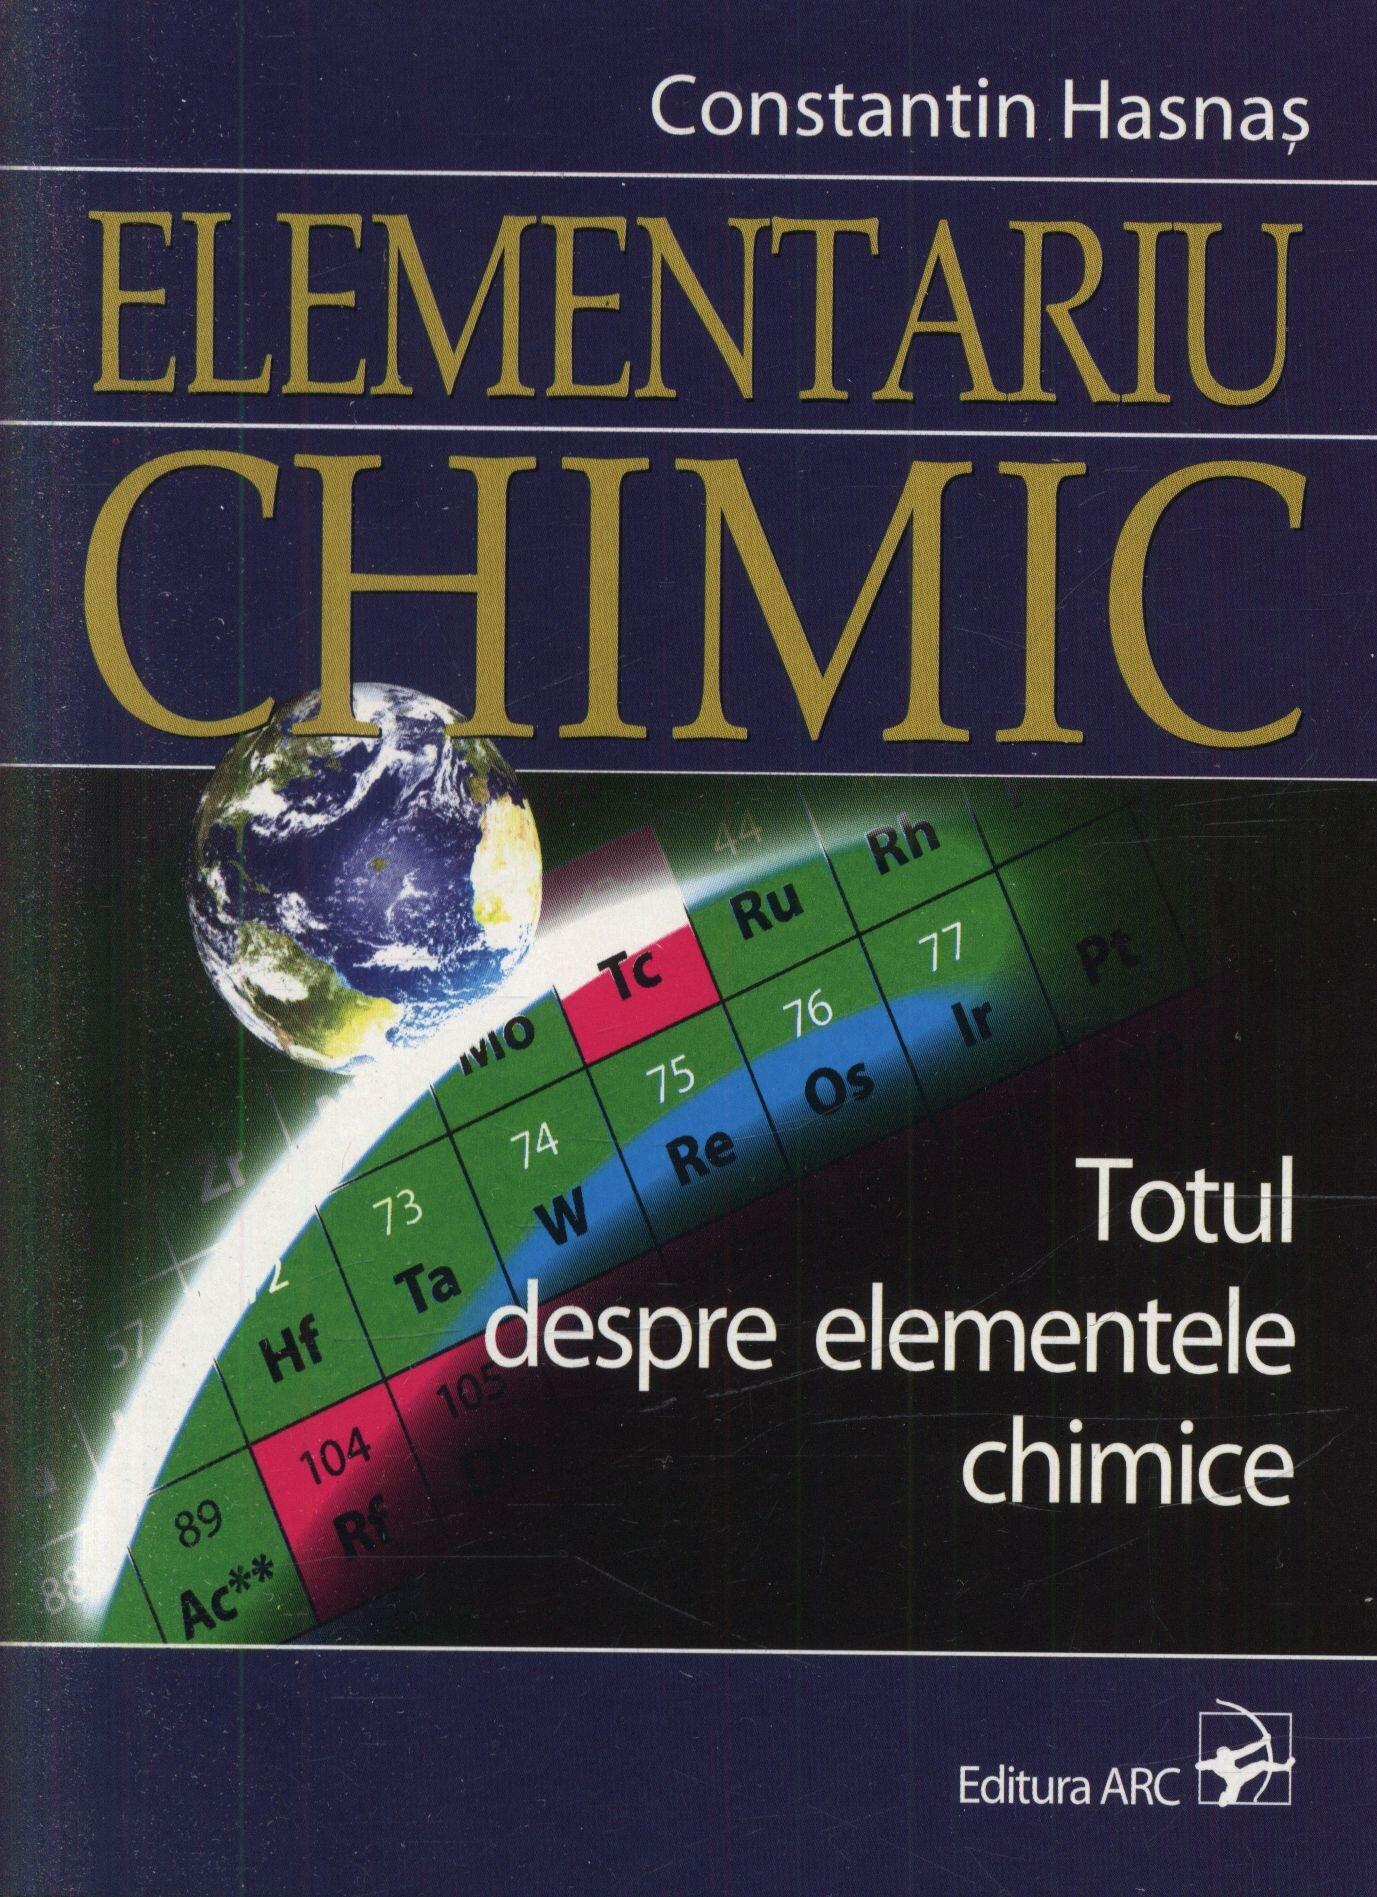 Elementariu chimic. Totul despre elementele chimice